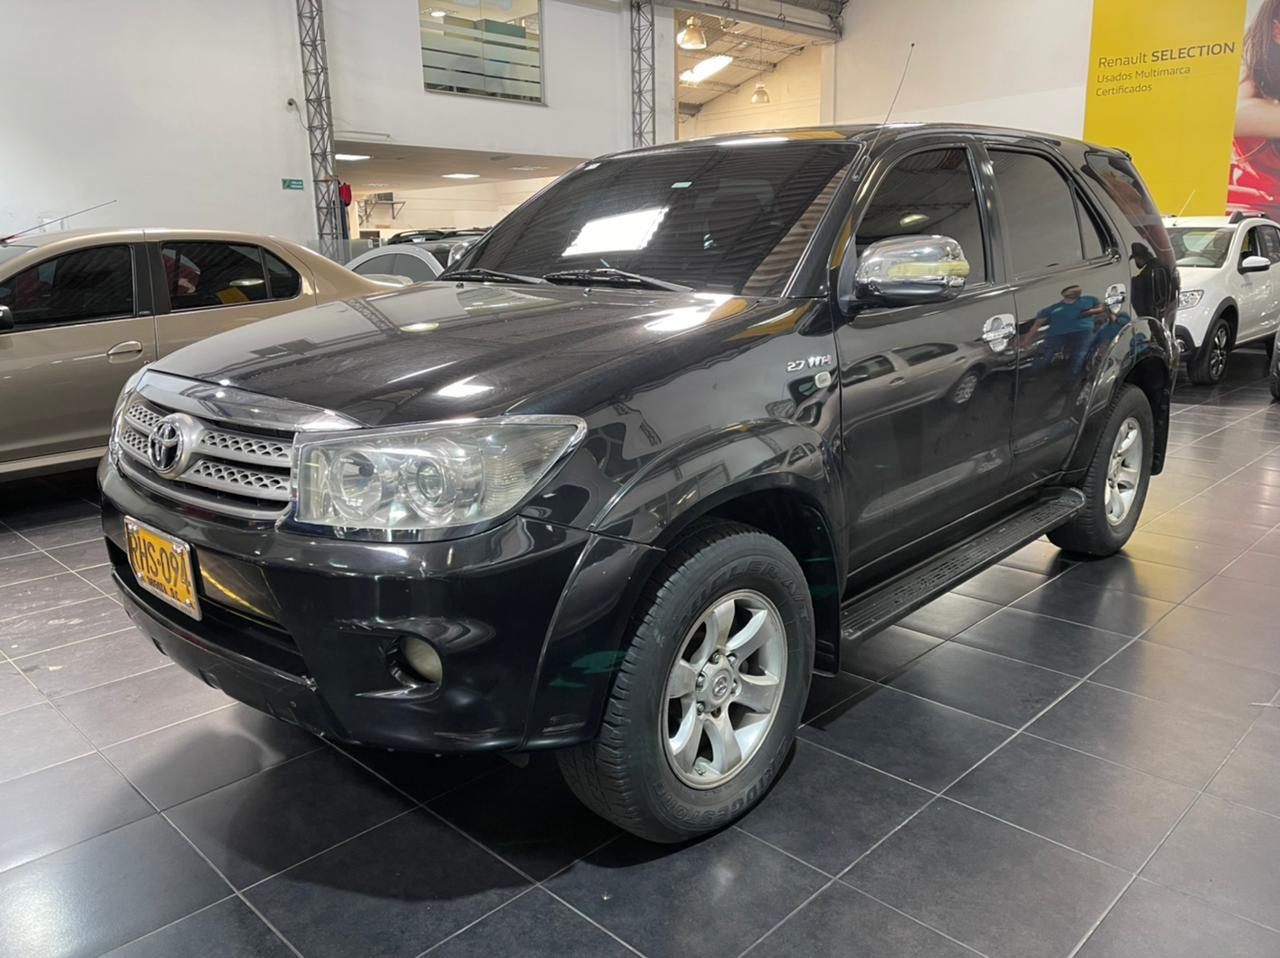 Toyota-Fortuner-01457277-1